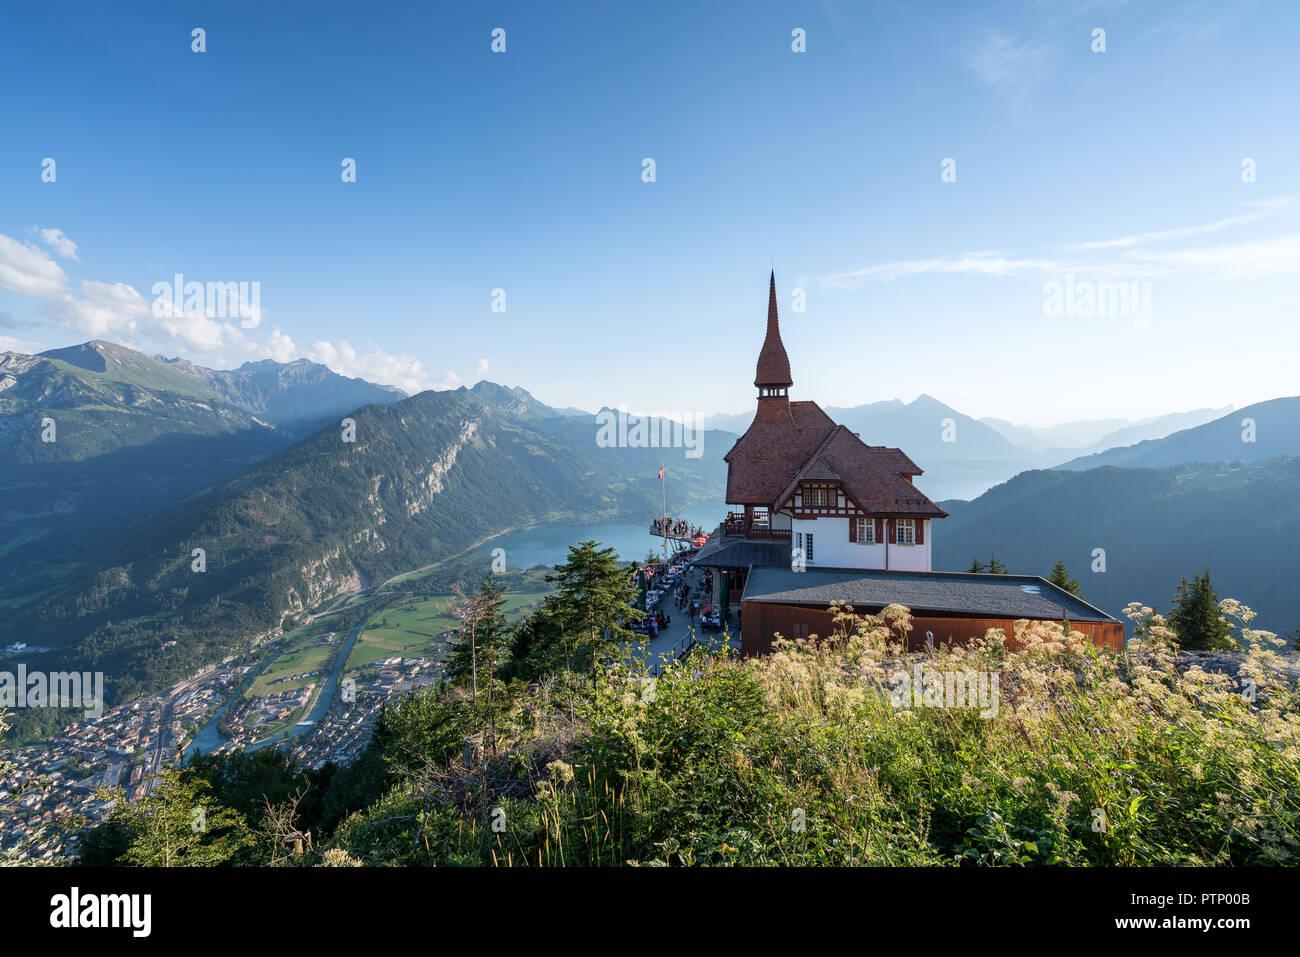 Harder Kulm viewpoint and reastaurant above Interlaken, Switzerland, Europe - Stock Image